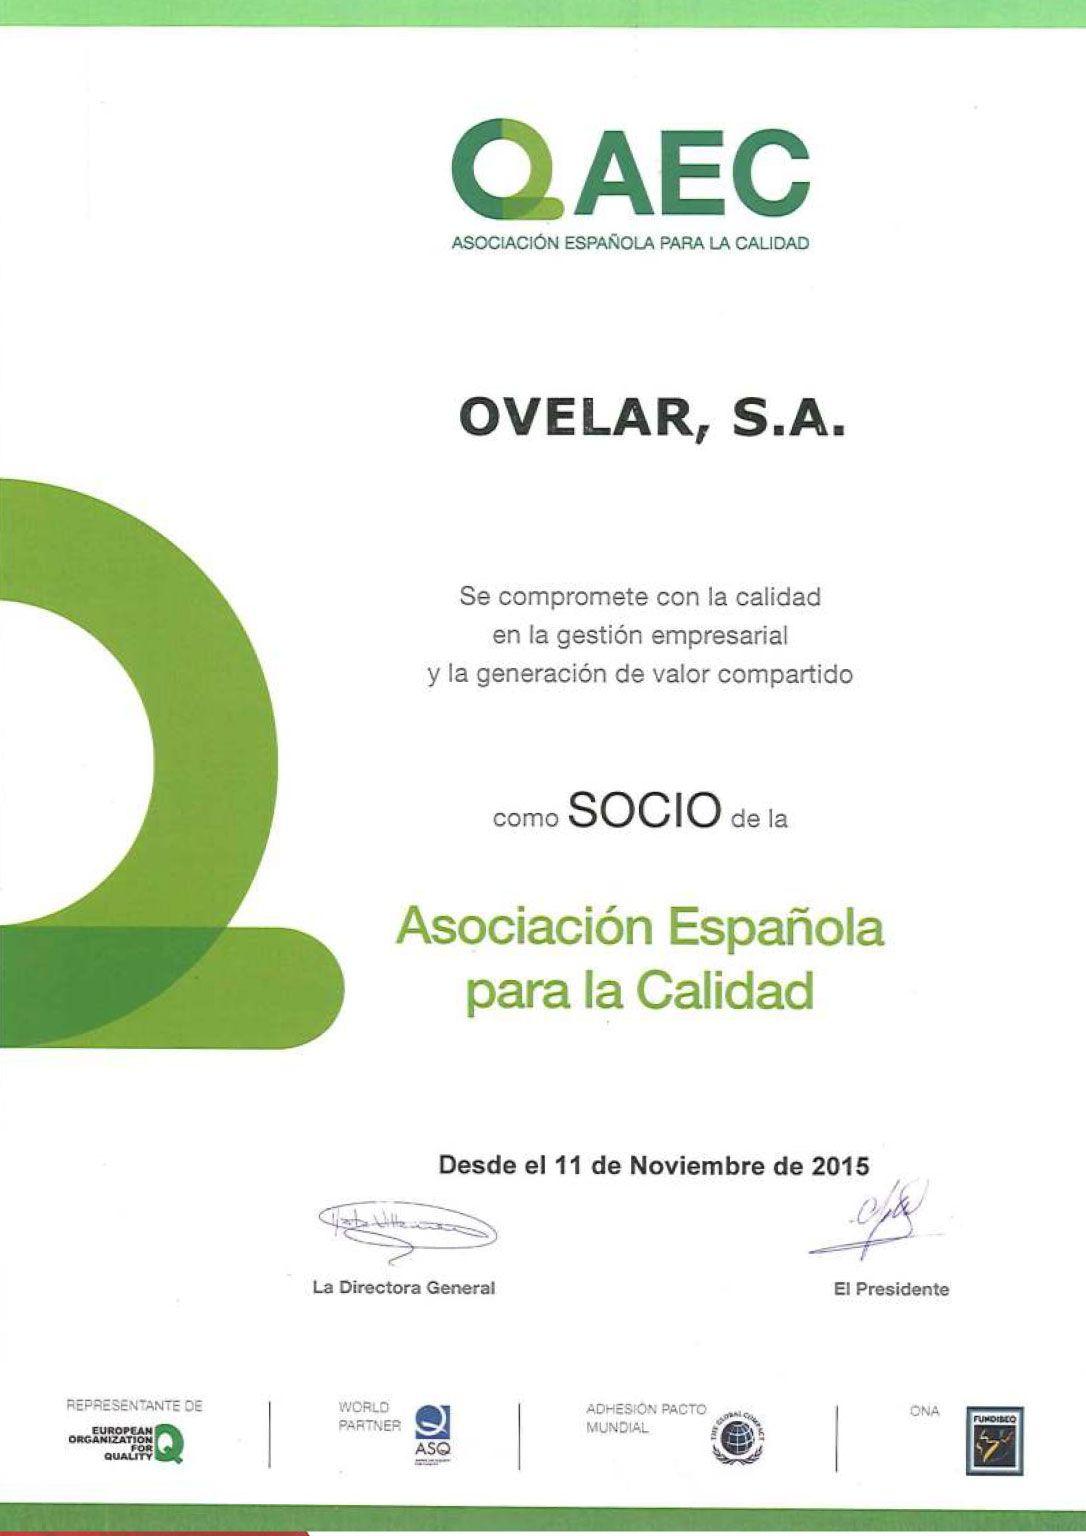 Certificados de calidad - Ovelar Retail